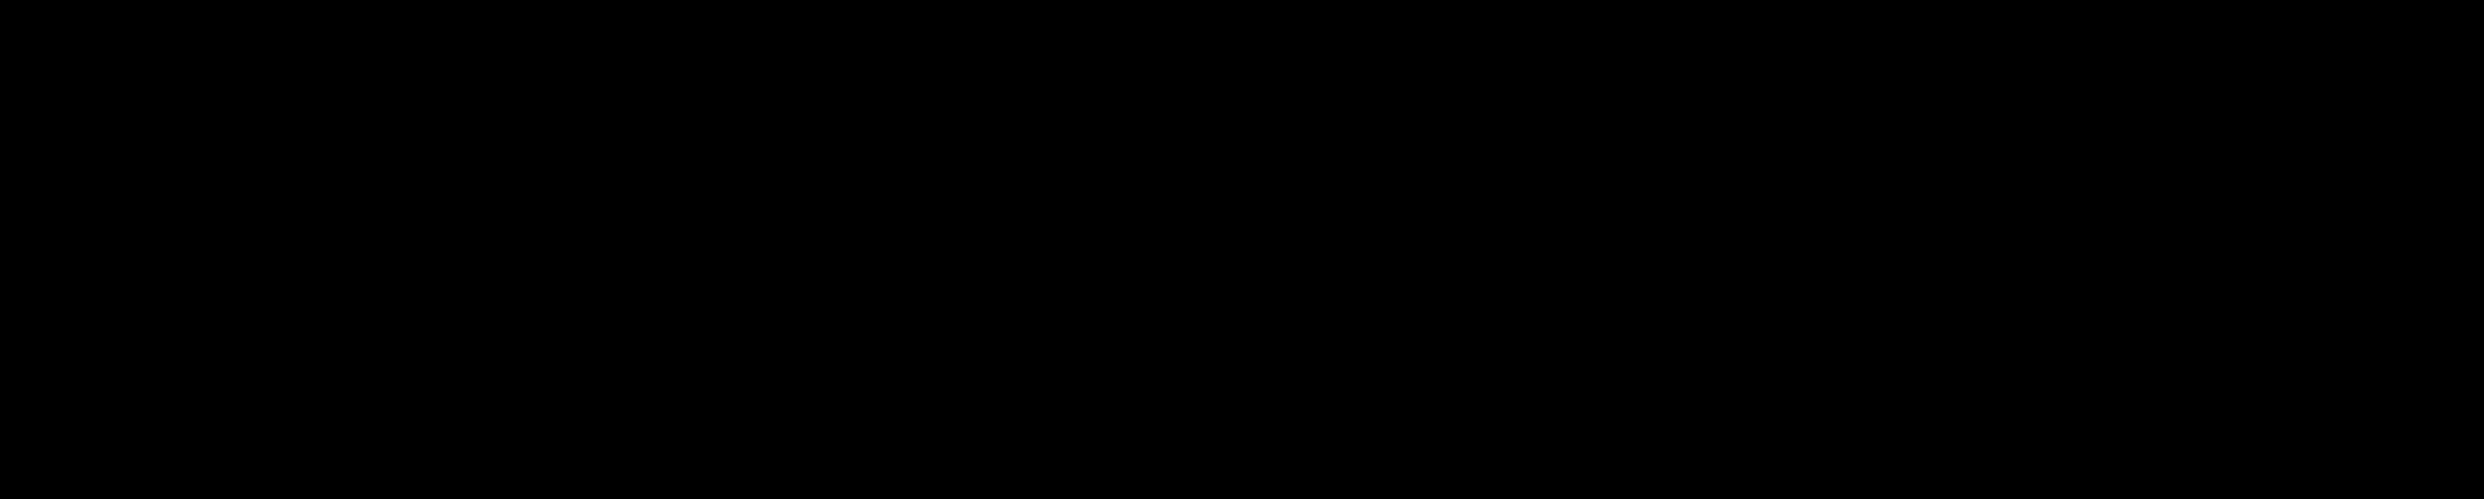 Quilt Fever logo